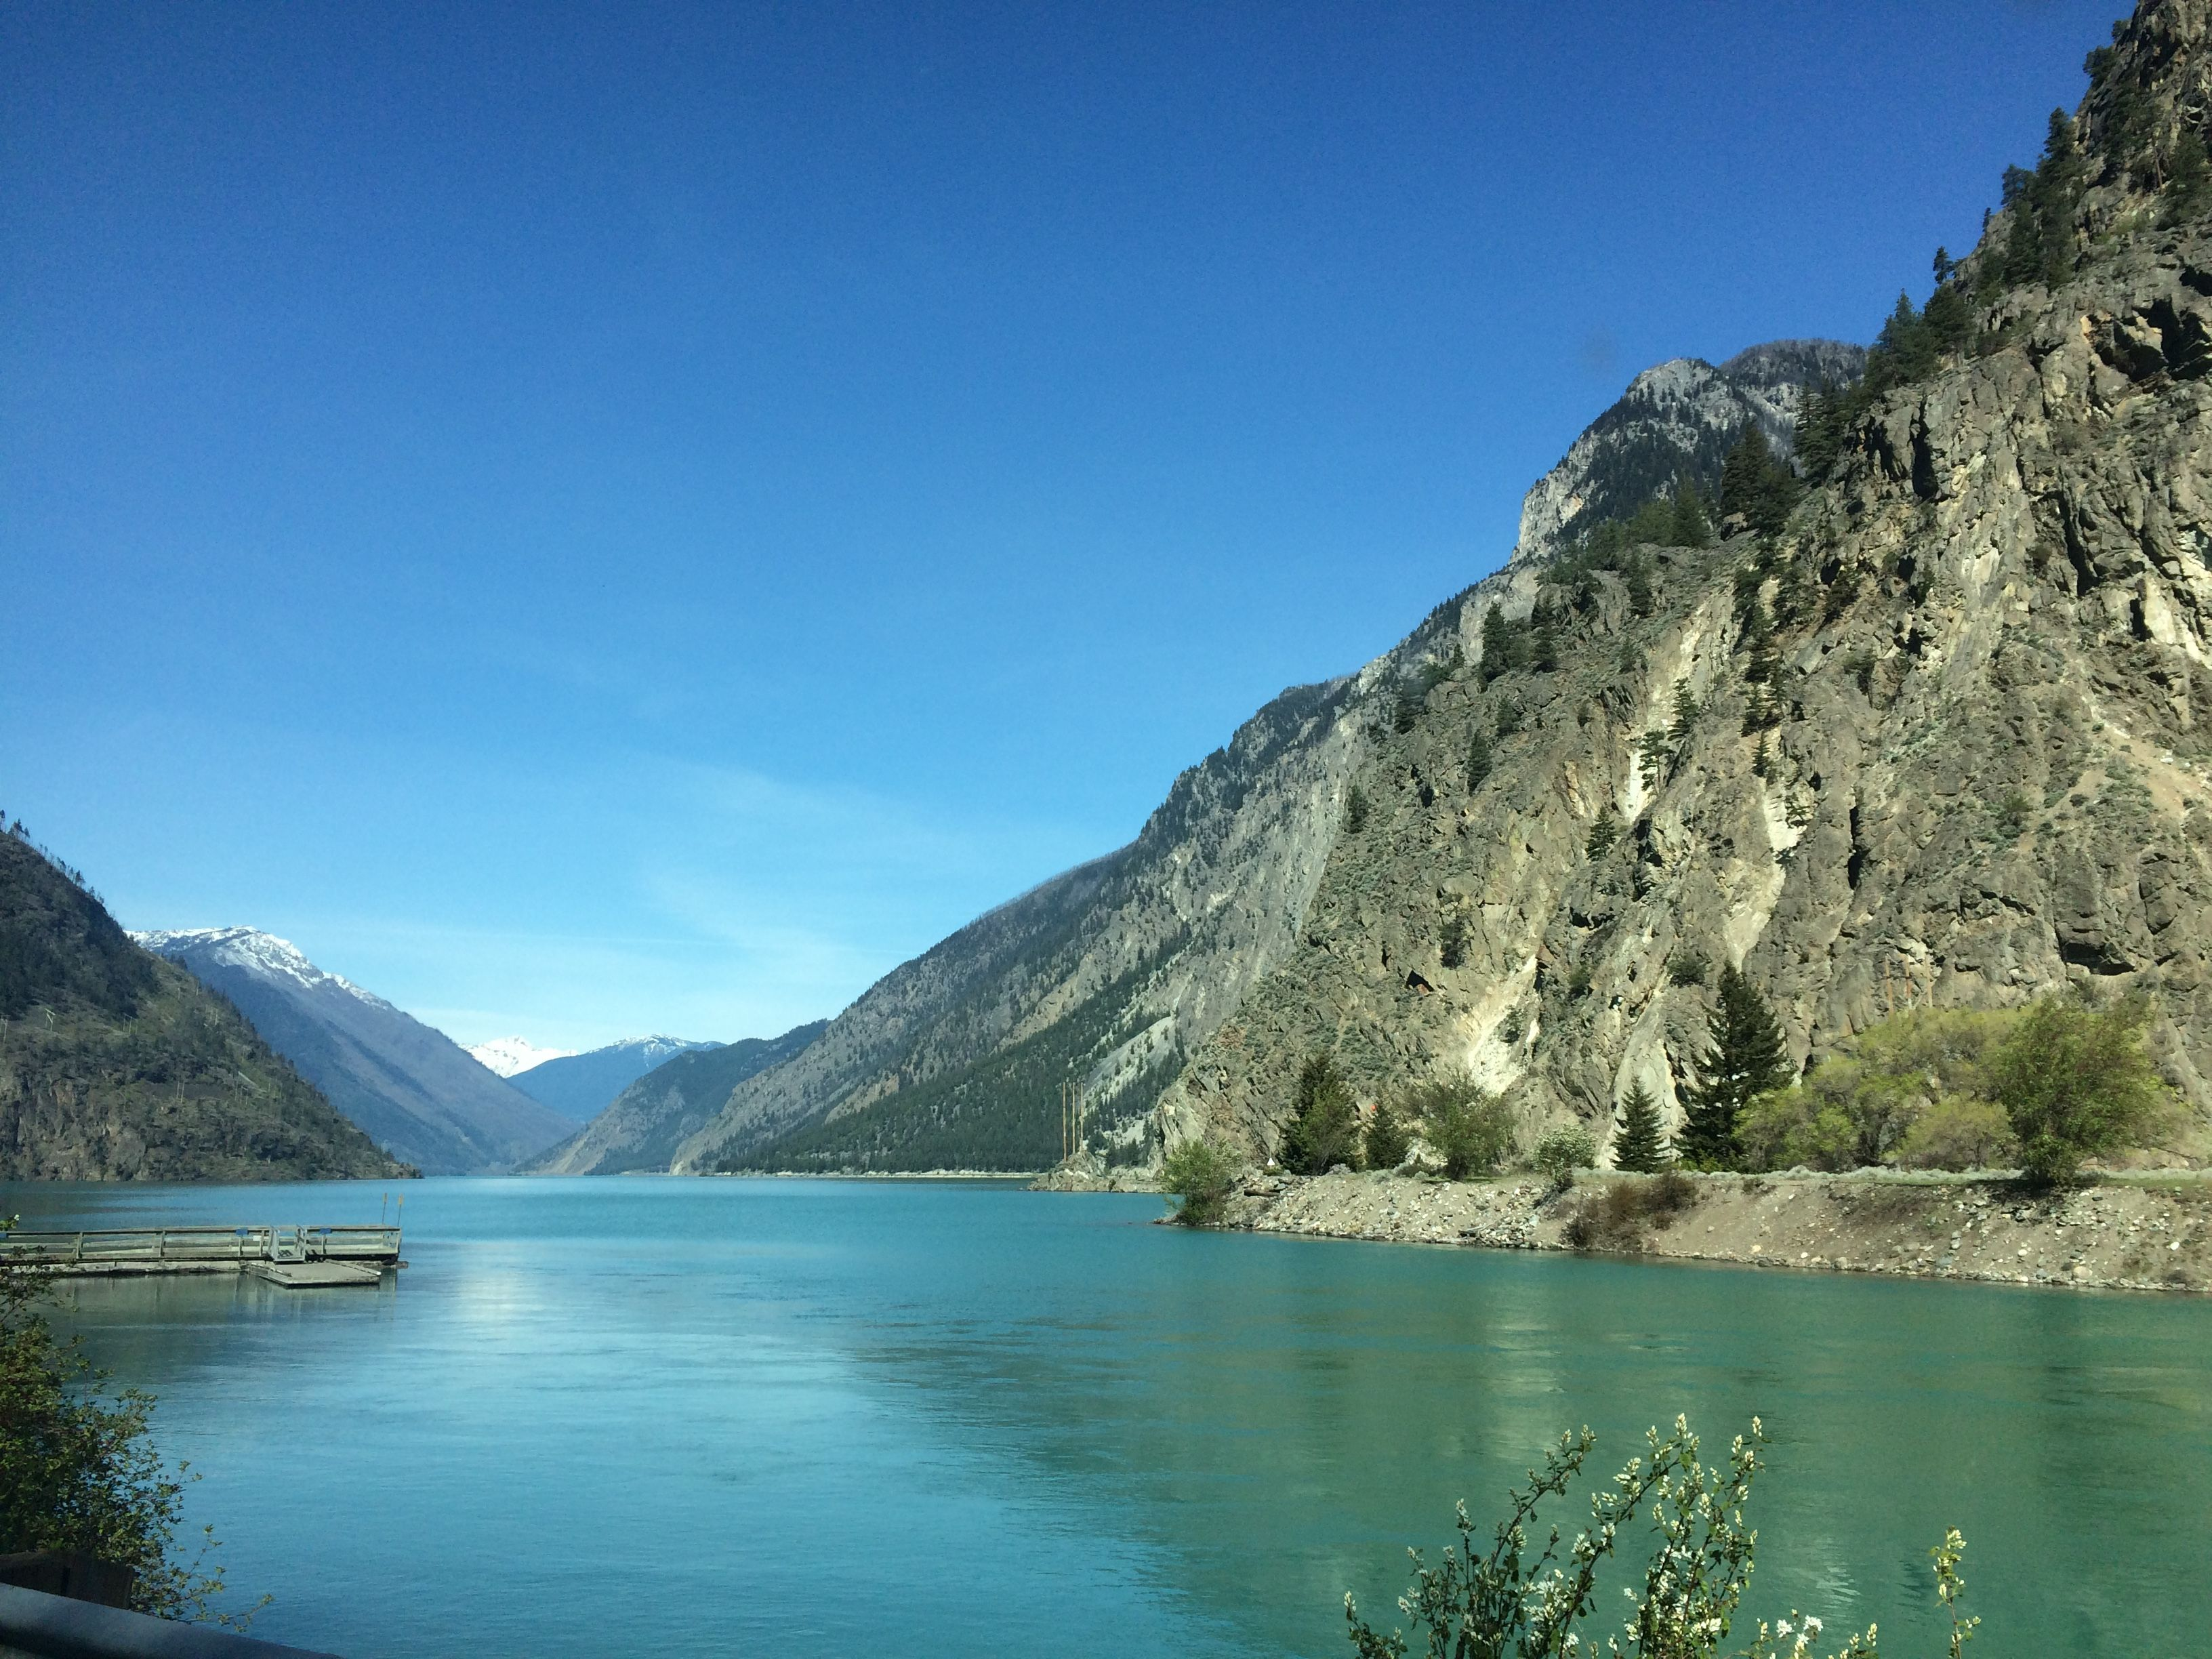 Seaton Lake, Lillooet BC Canada